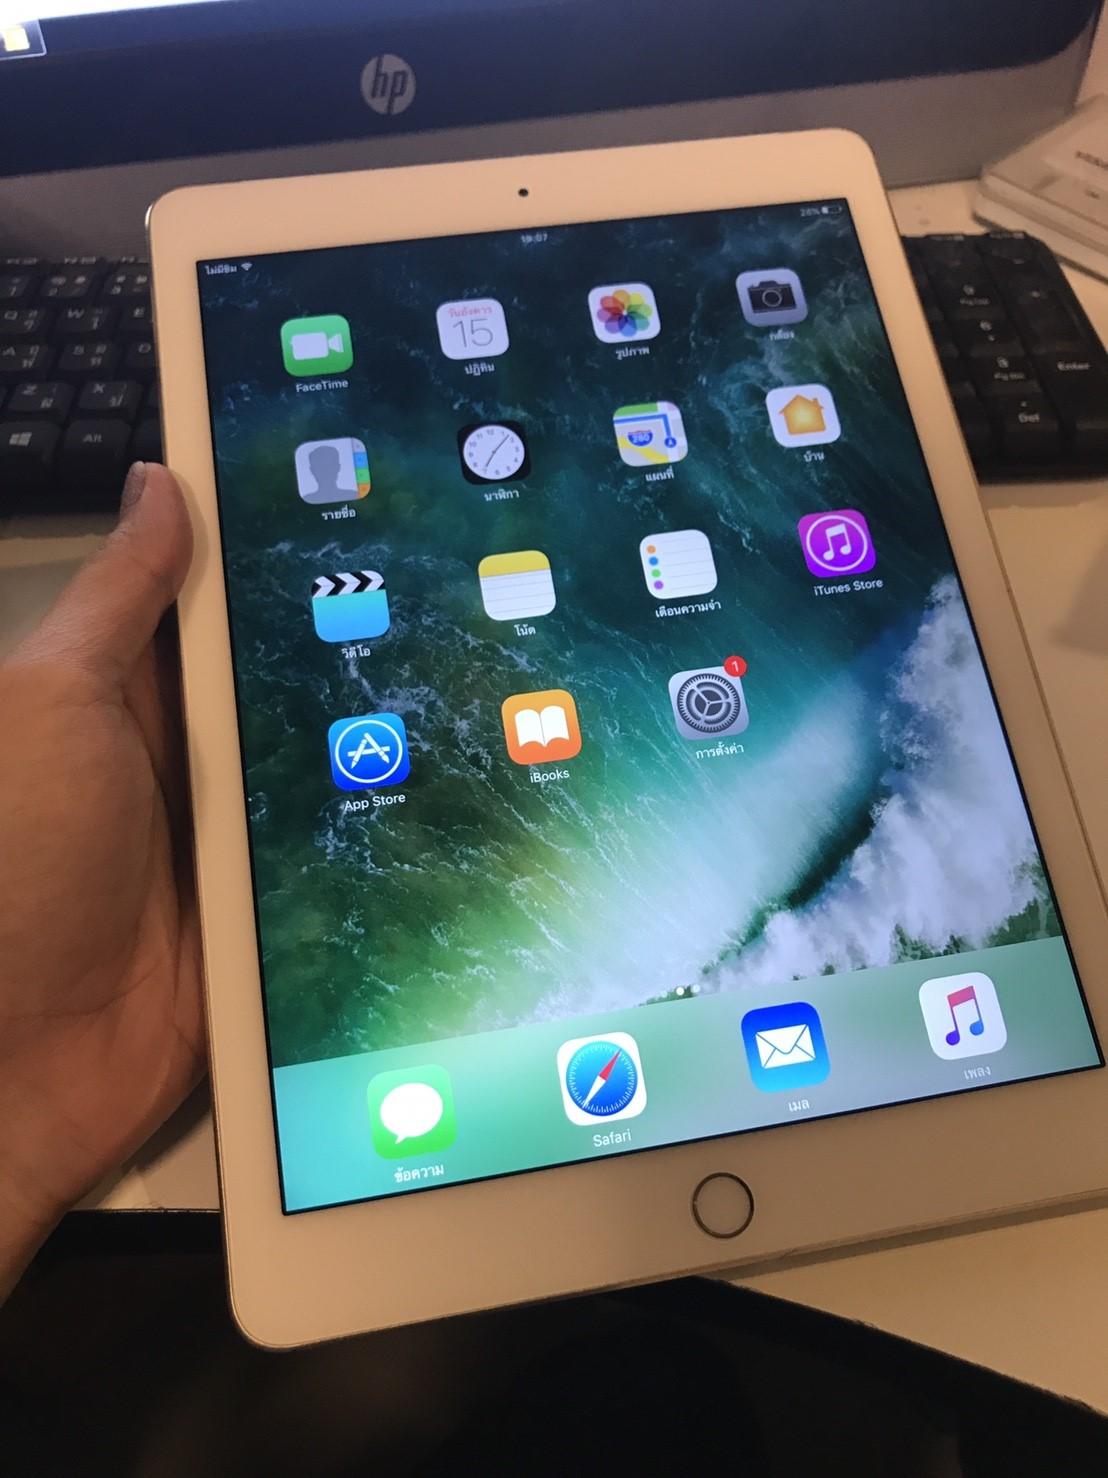 JMM-66 ขาย iPad Air2 Cellular 64 Gb ราคา 12,500 บาท